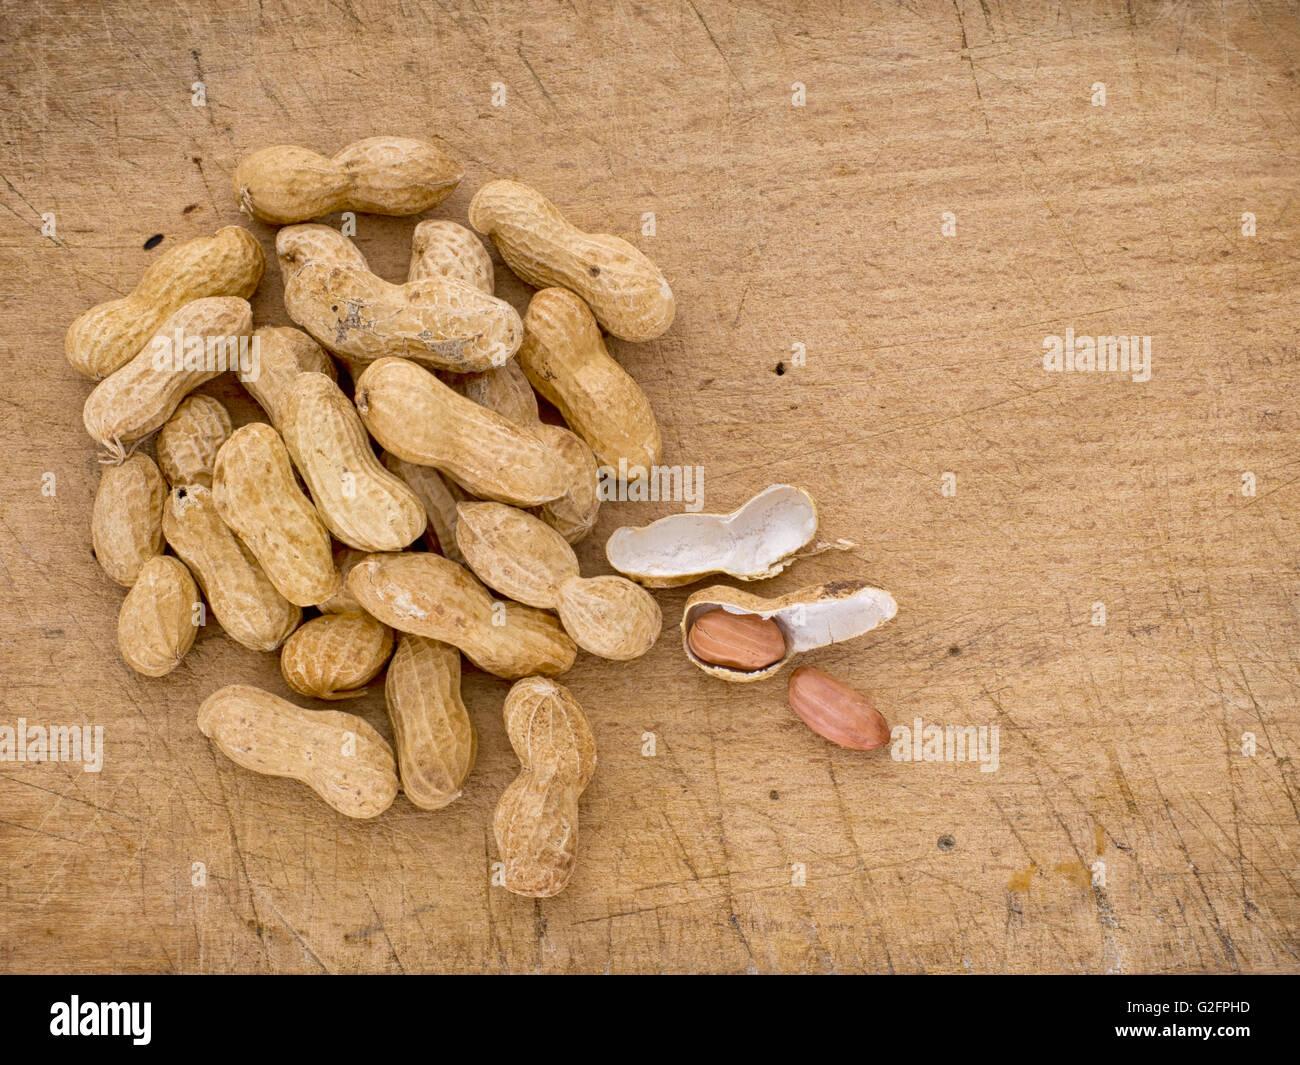 Monkey nuts aka peanuts aka groundnuts on board in shells. Stock Photo